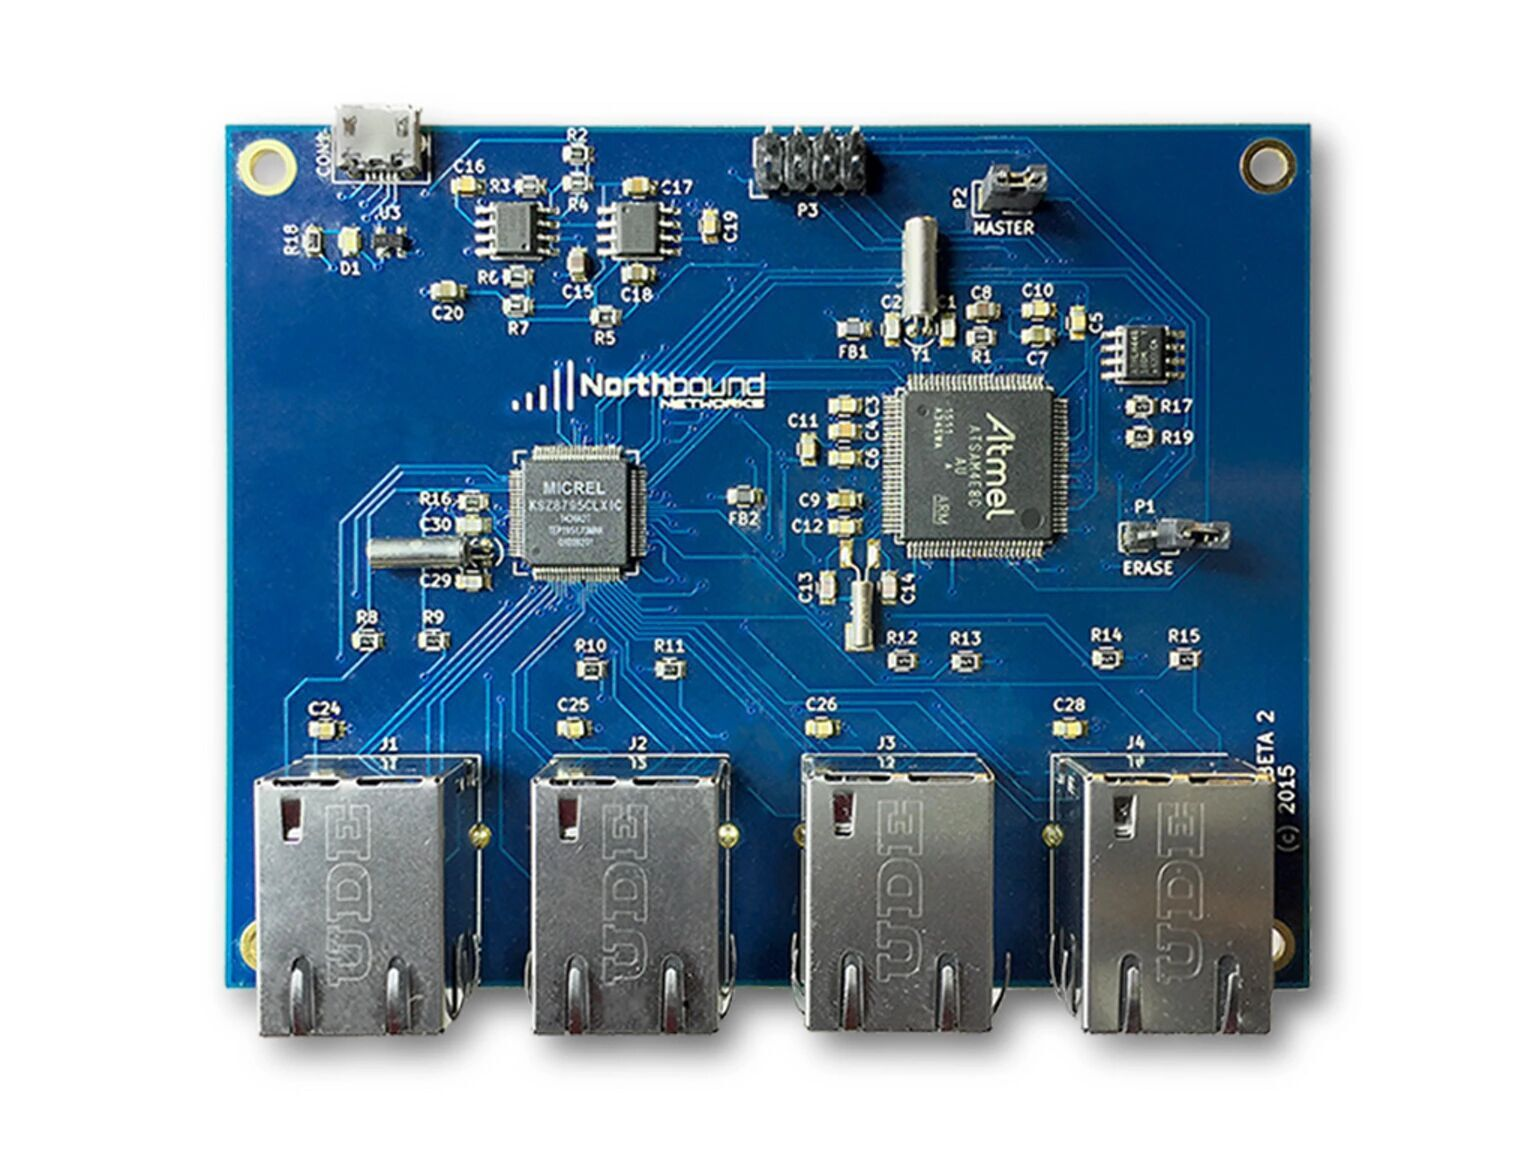 Zodiac FX:世界上最小的OpenFlow交换机